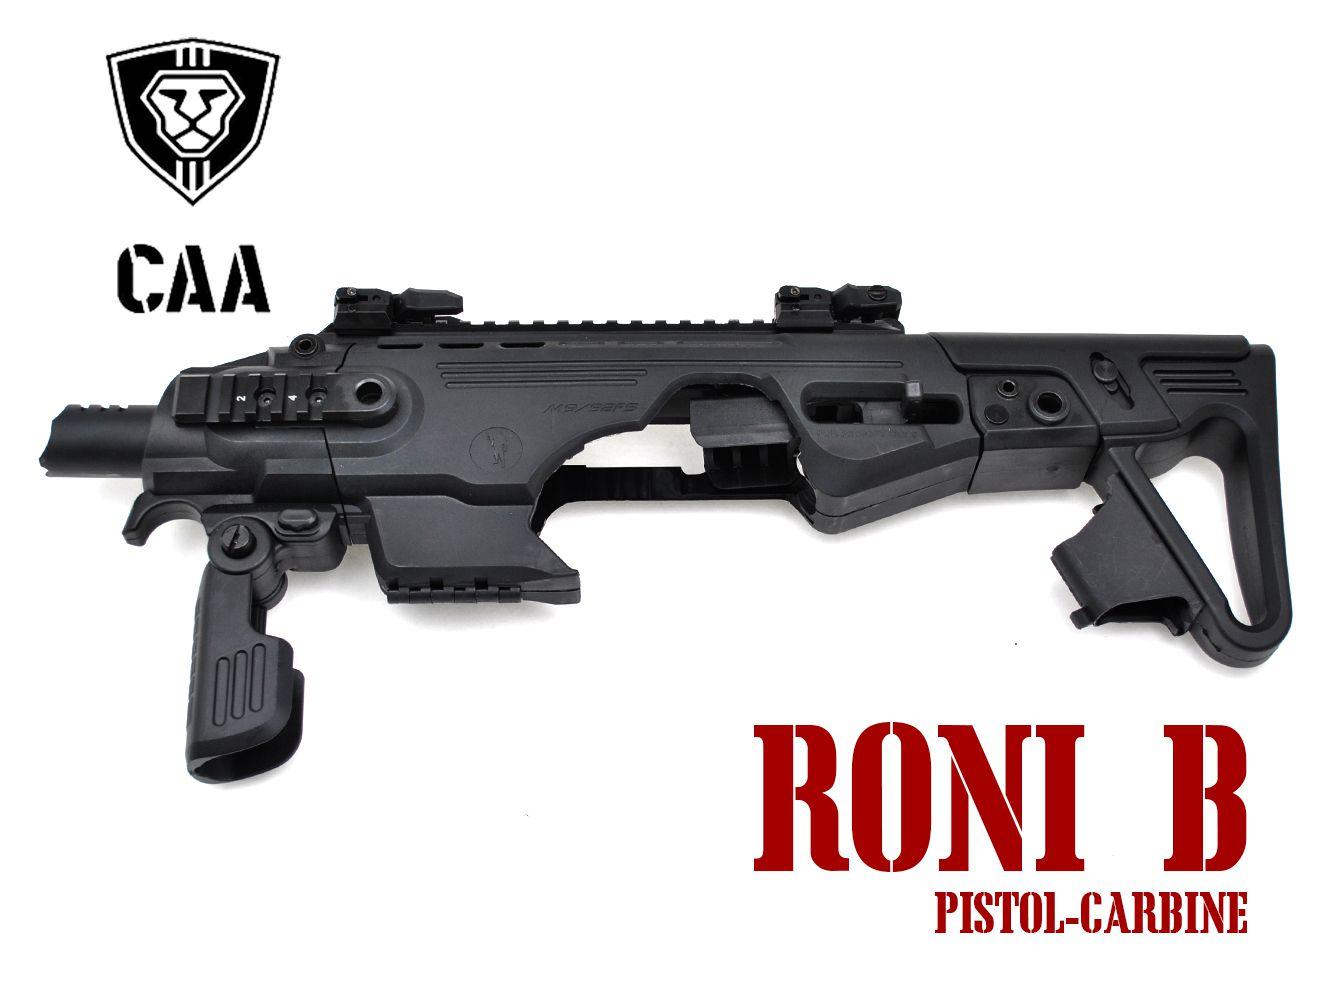 CAA Airsoft RONI-B Pistol-Carbine コンバージョン for M92F/M9A1 BK